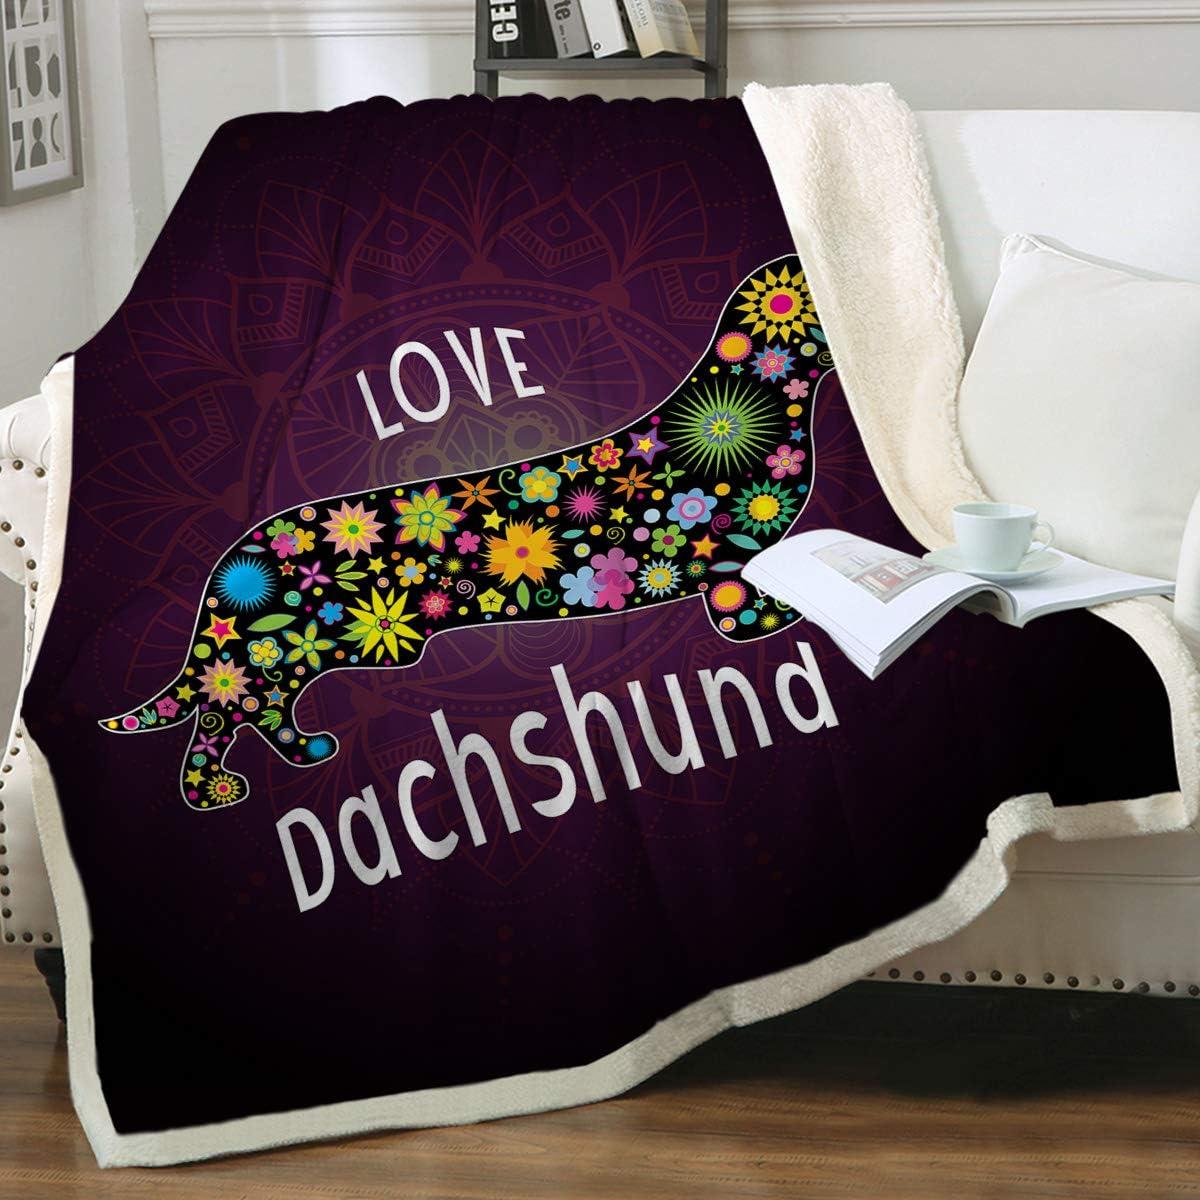 Cute Dachshund Faces Gift For Dog Lover Animal Sherpa Fleece Blanket